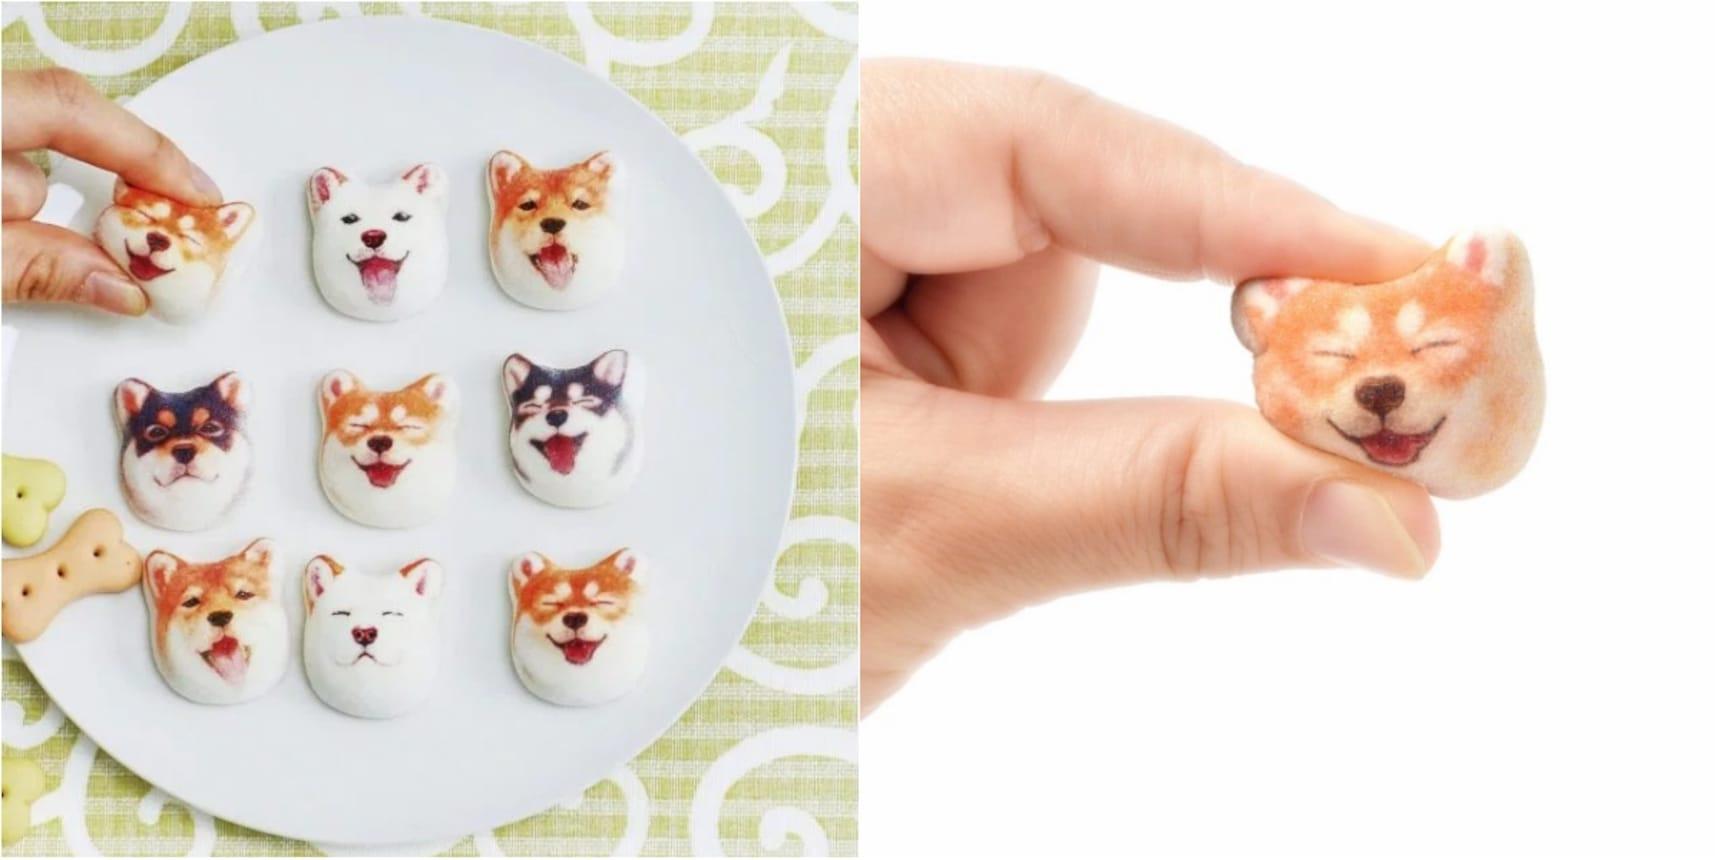 Kawaii Shiba Inu Marshmallows Too Sweet to Eat